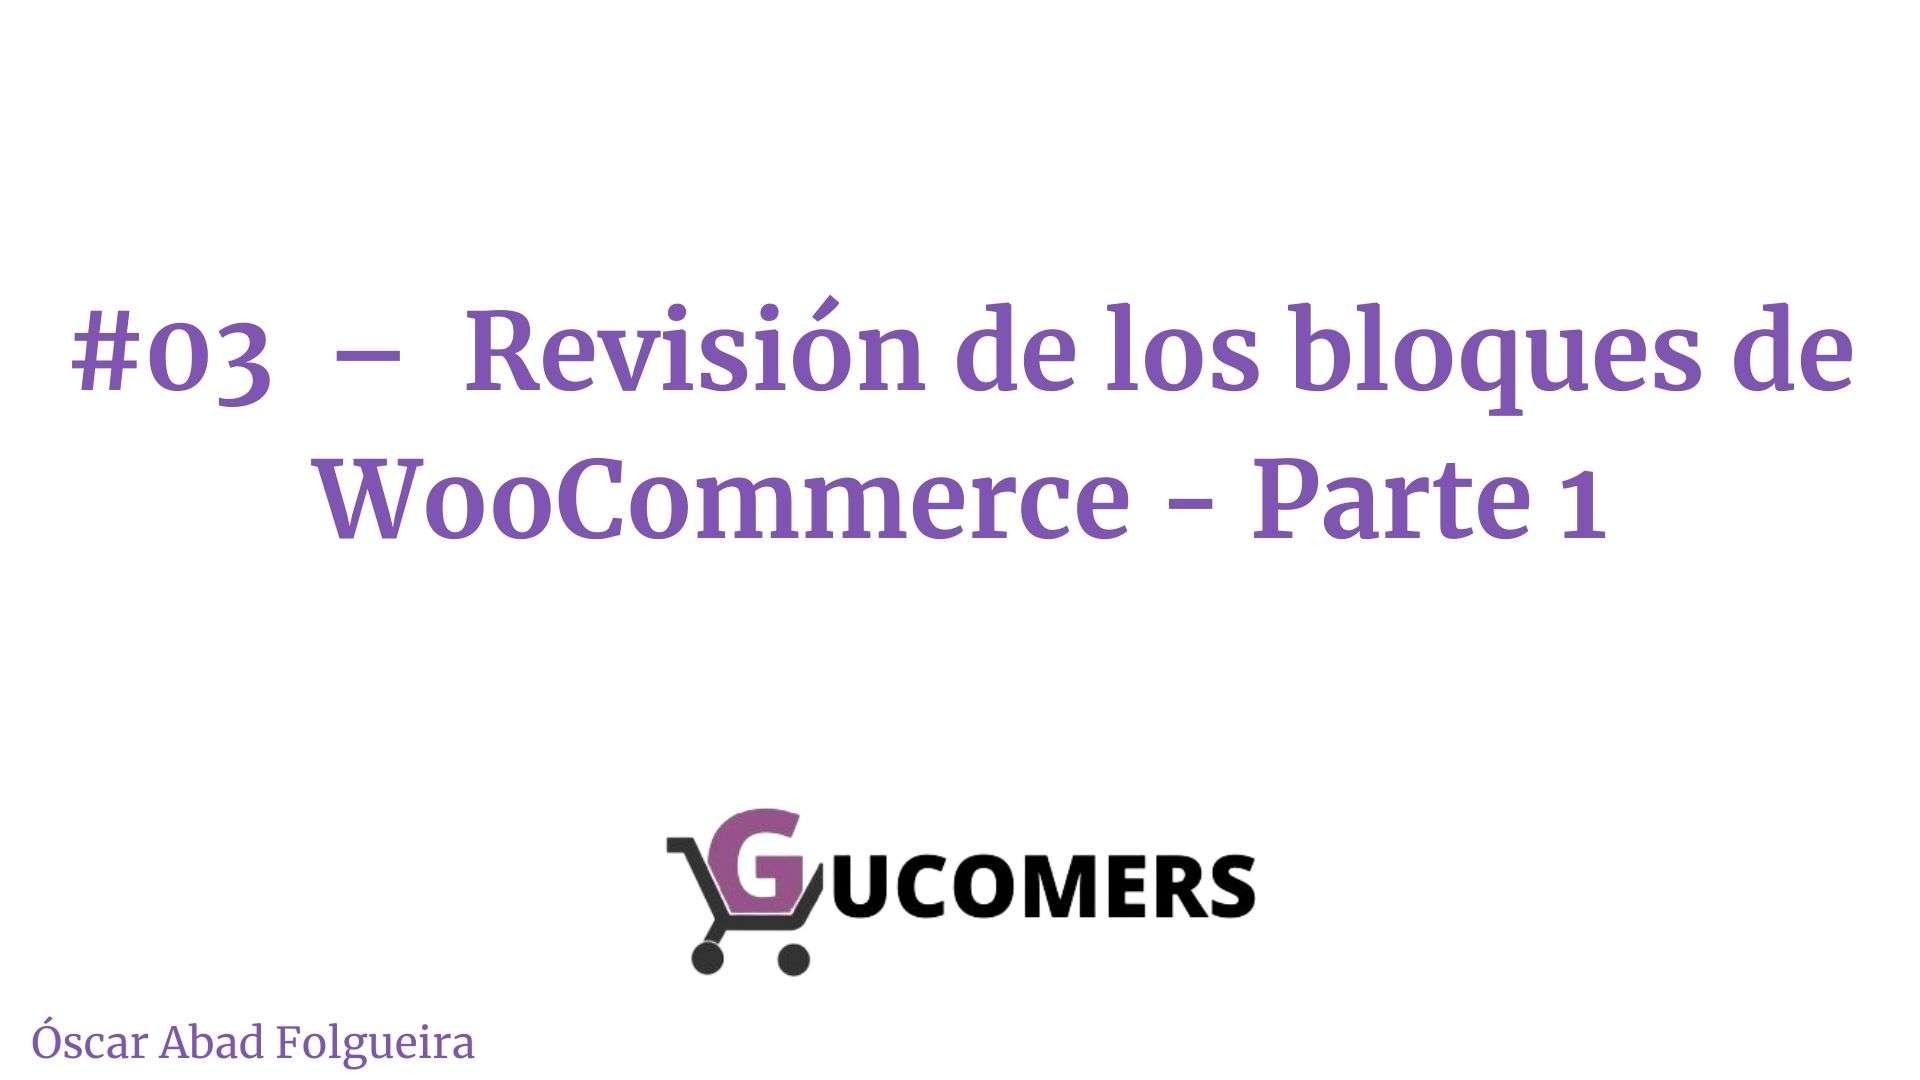 Podcast Gucomers - 03 revisión de los bloques de WooCommerce - parte 1